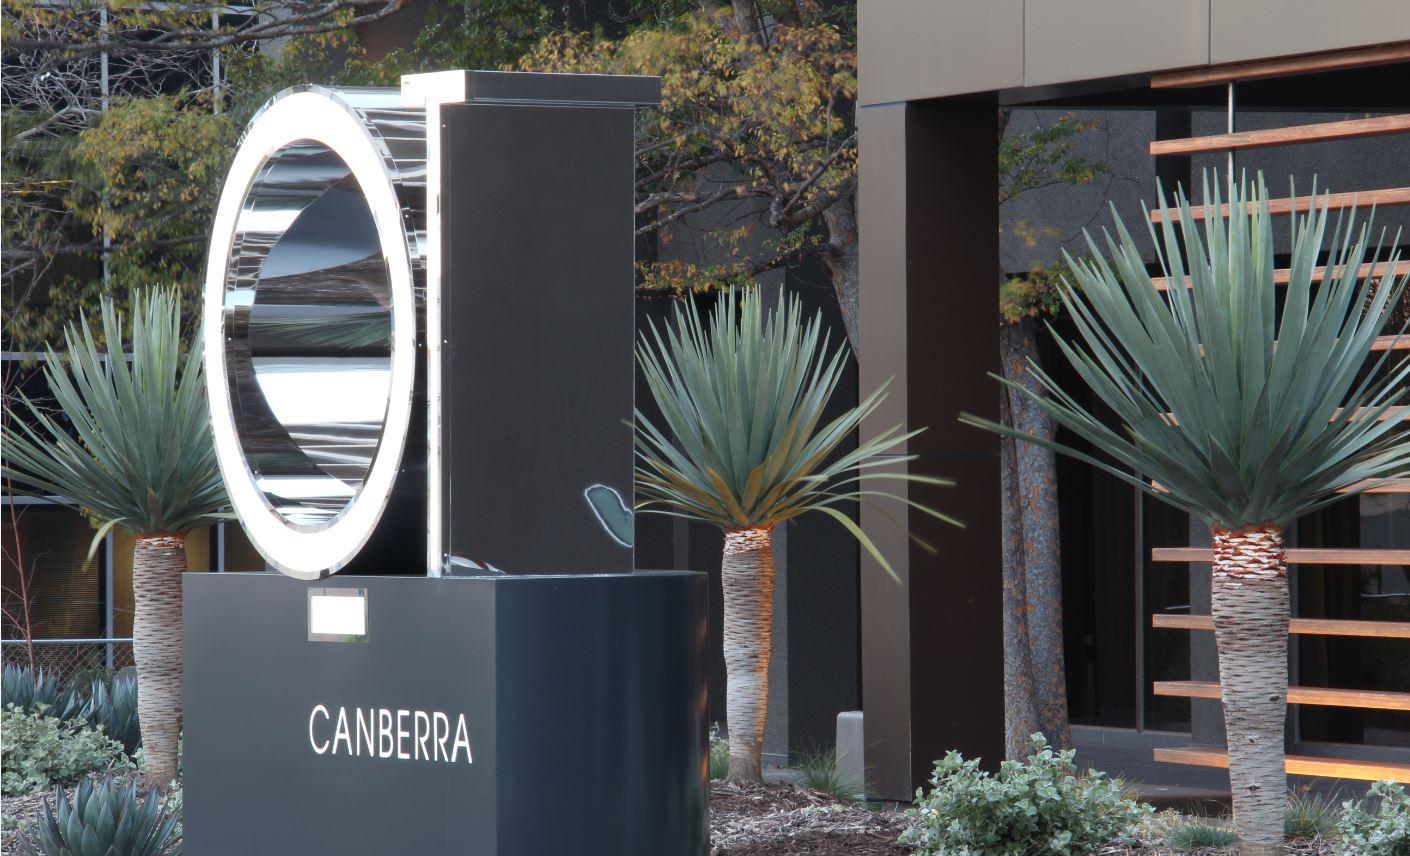 QT-canberra-sign.jpg